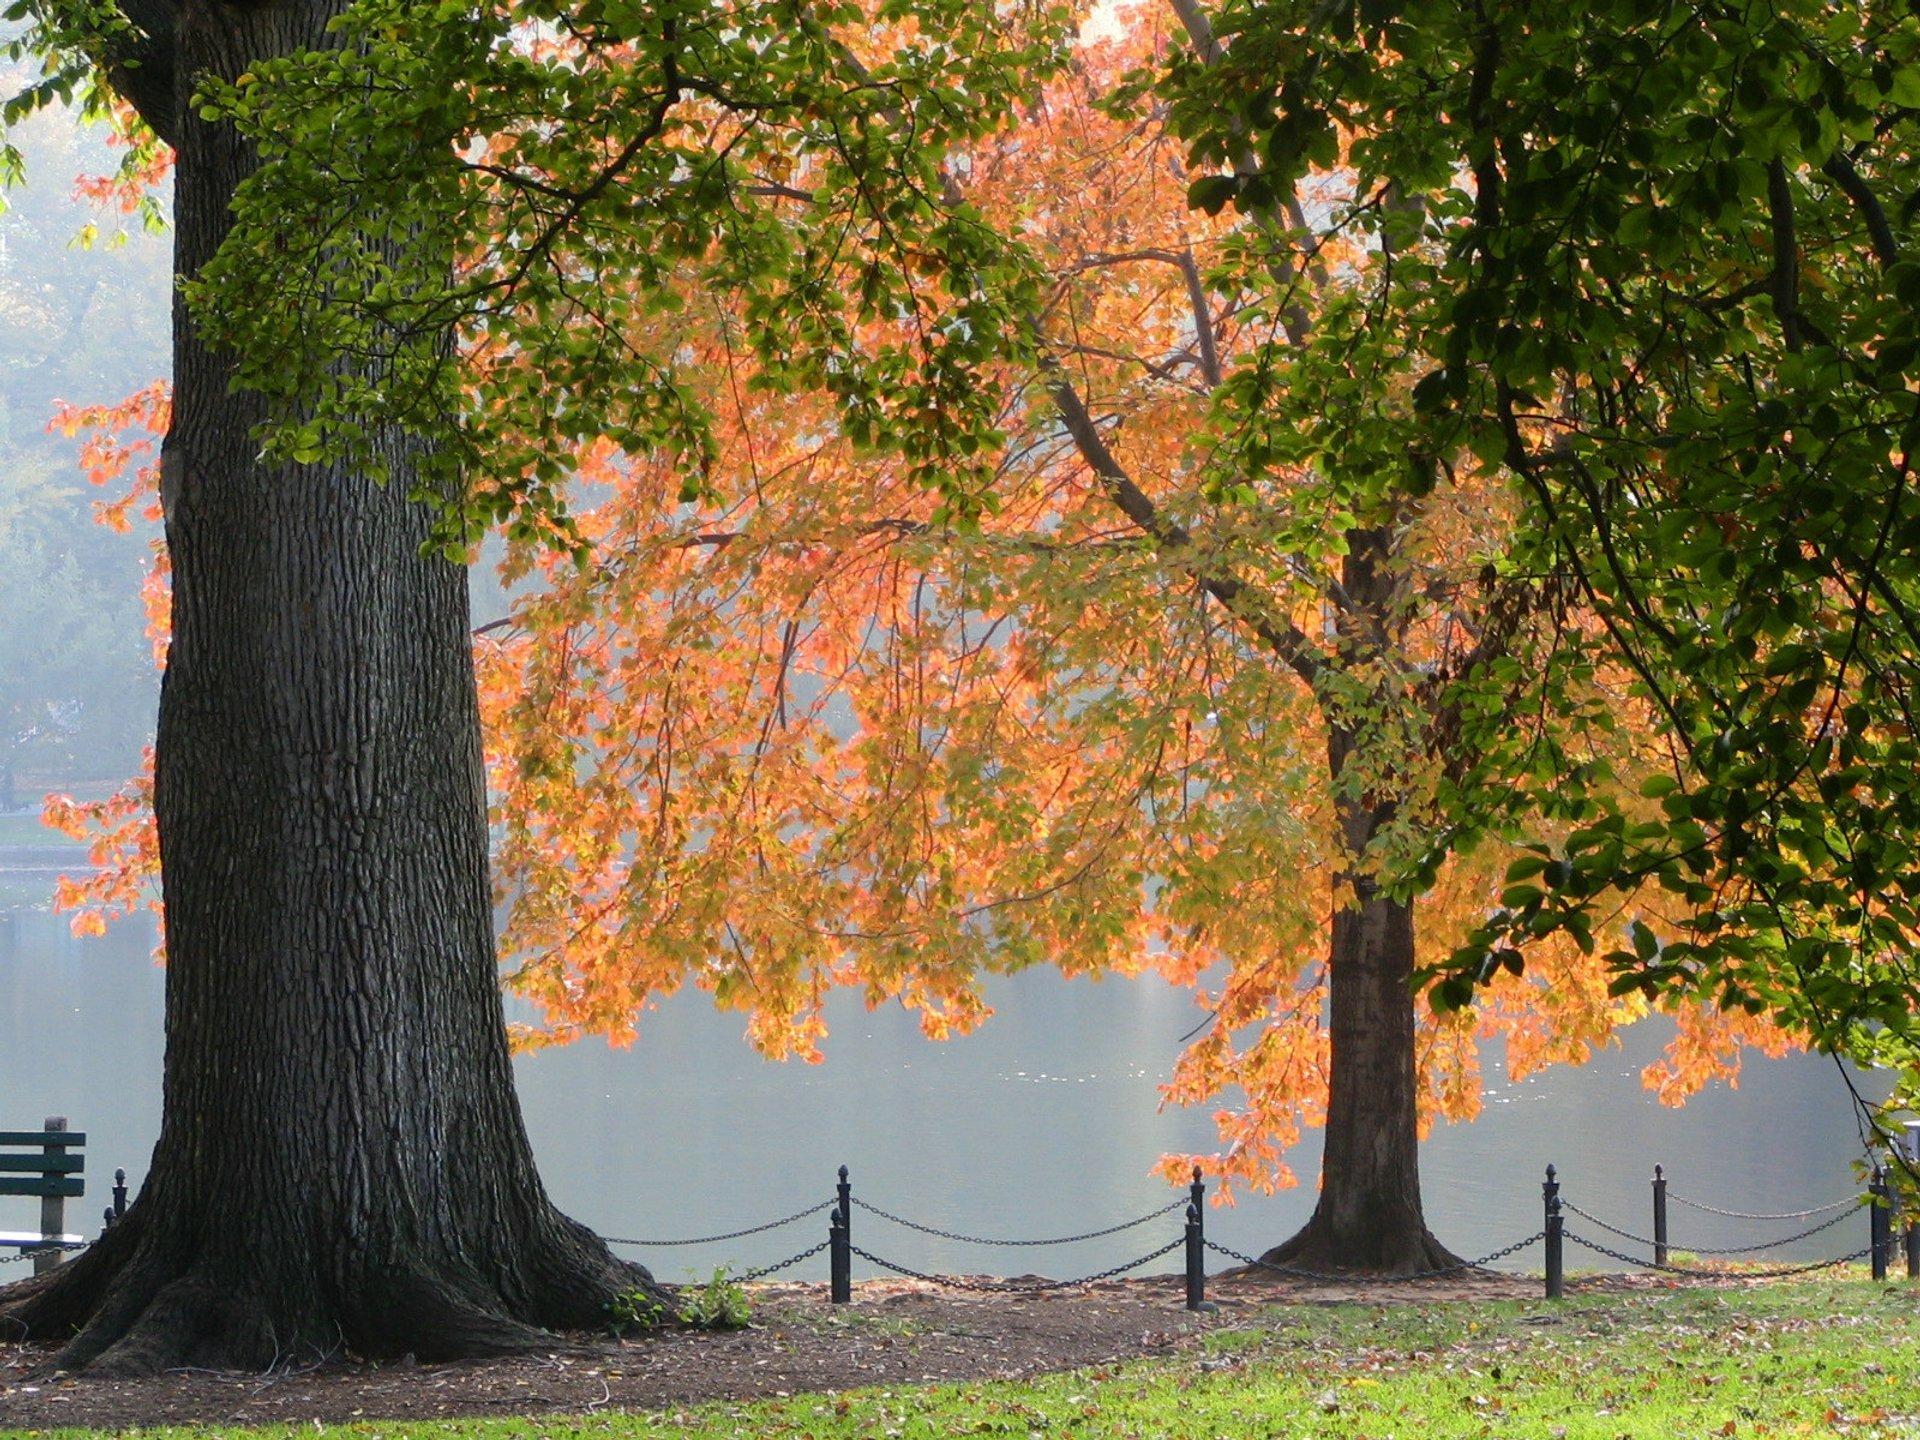 Charles River foliage, Boston 2020